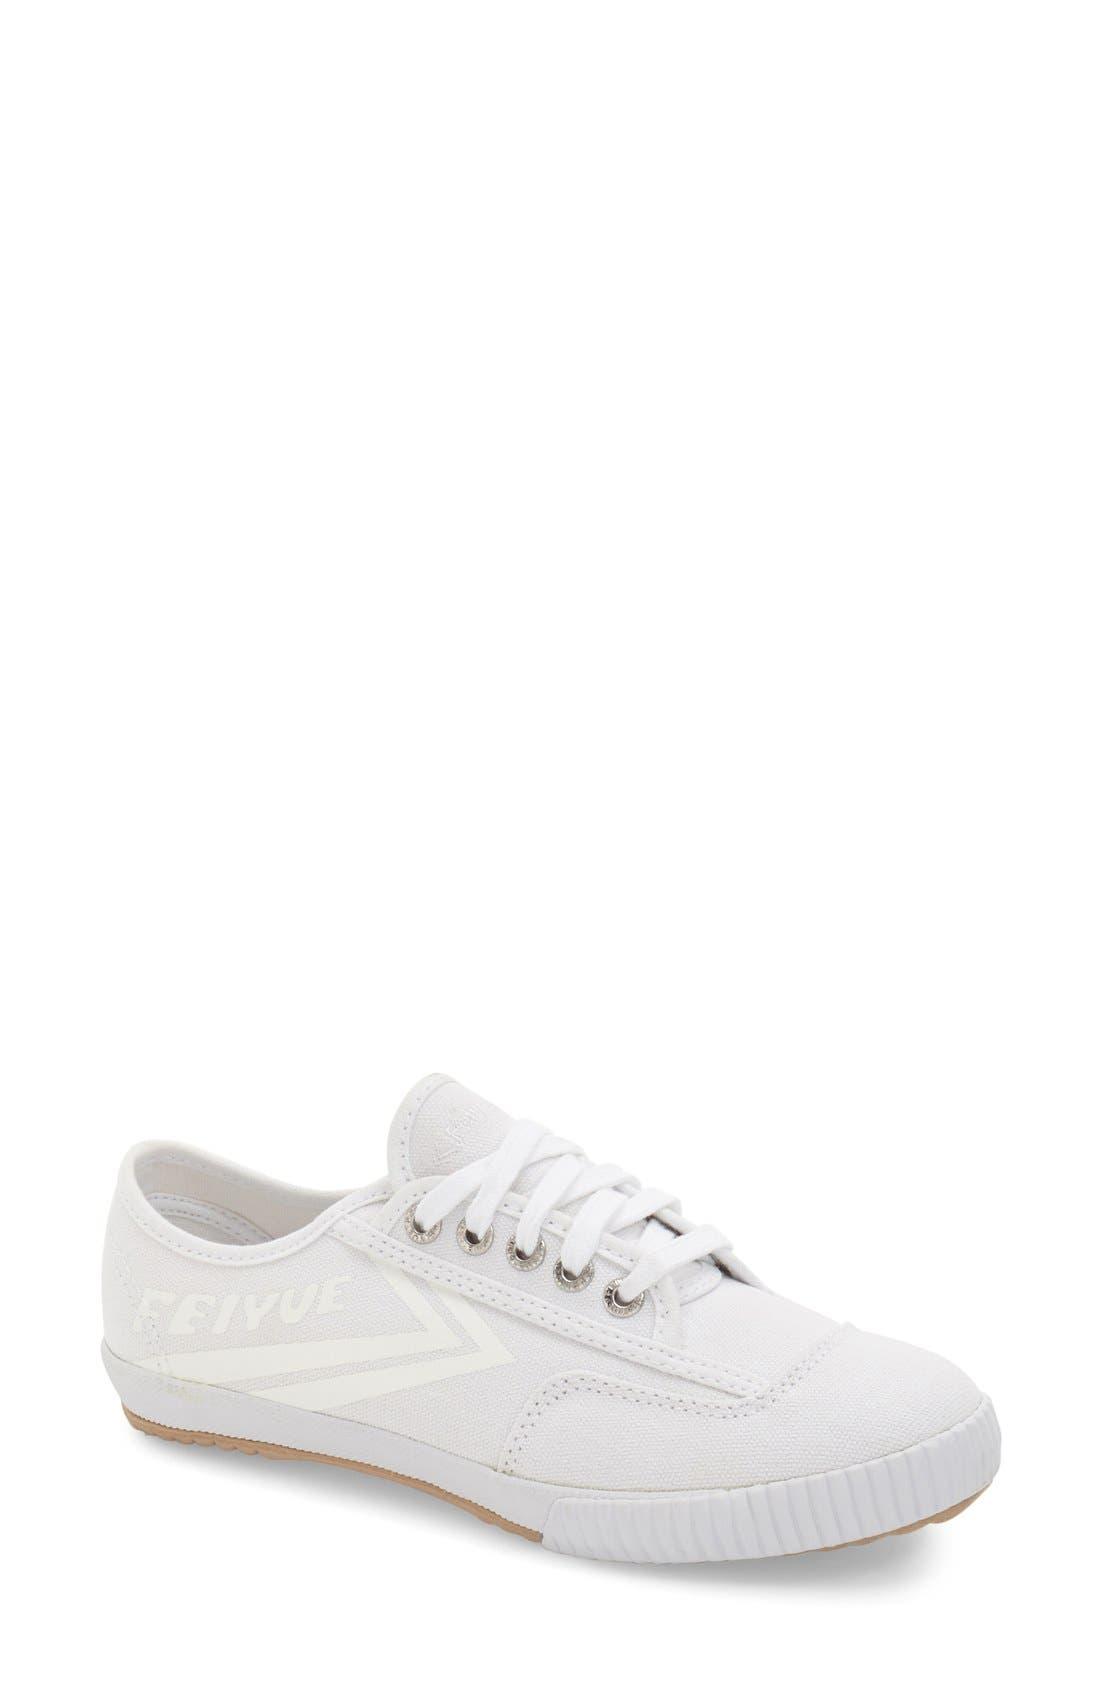 Main Image - Feiyue. 'Fe Lo Plain' Canvas Sneaker (Women)